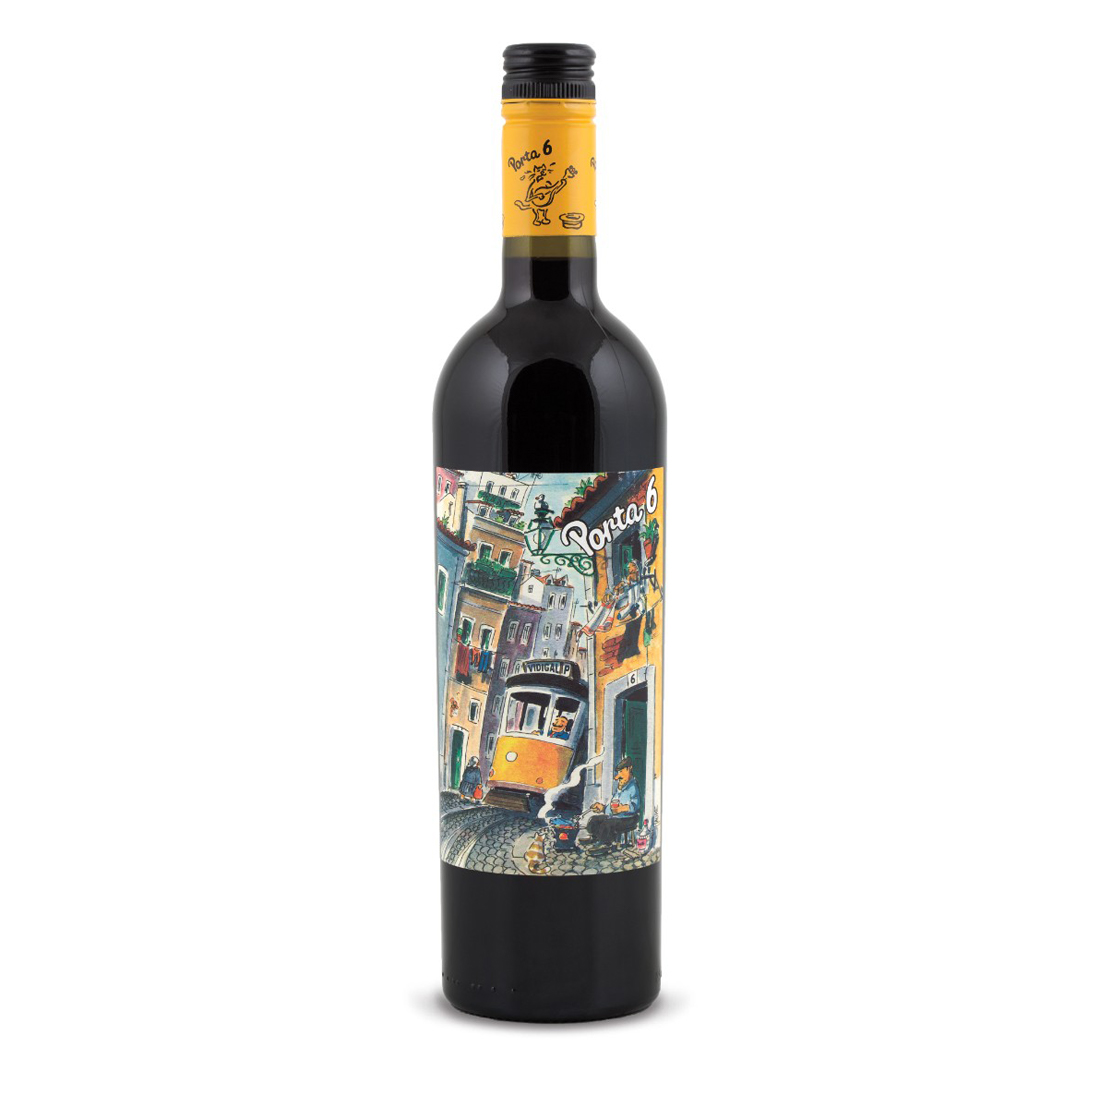 Vinho Porta 6 750 ml